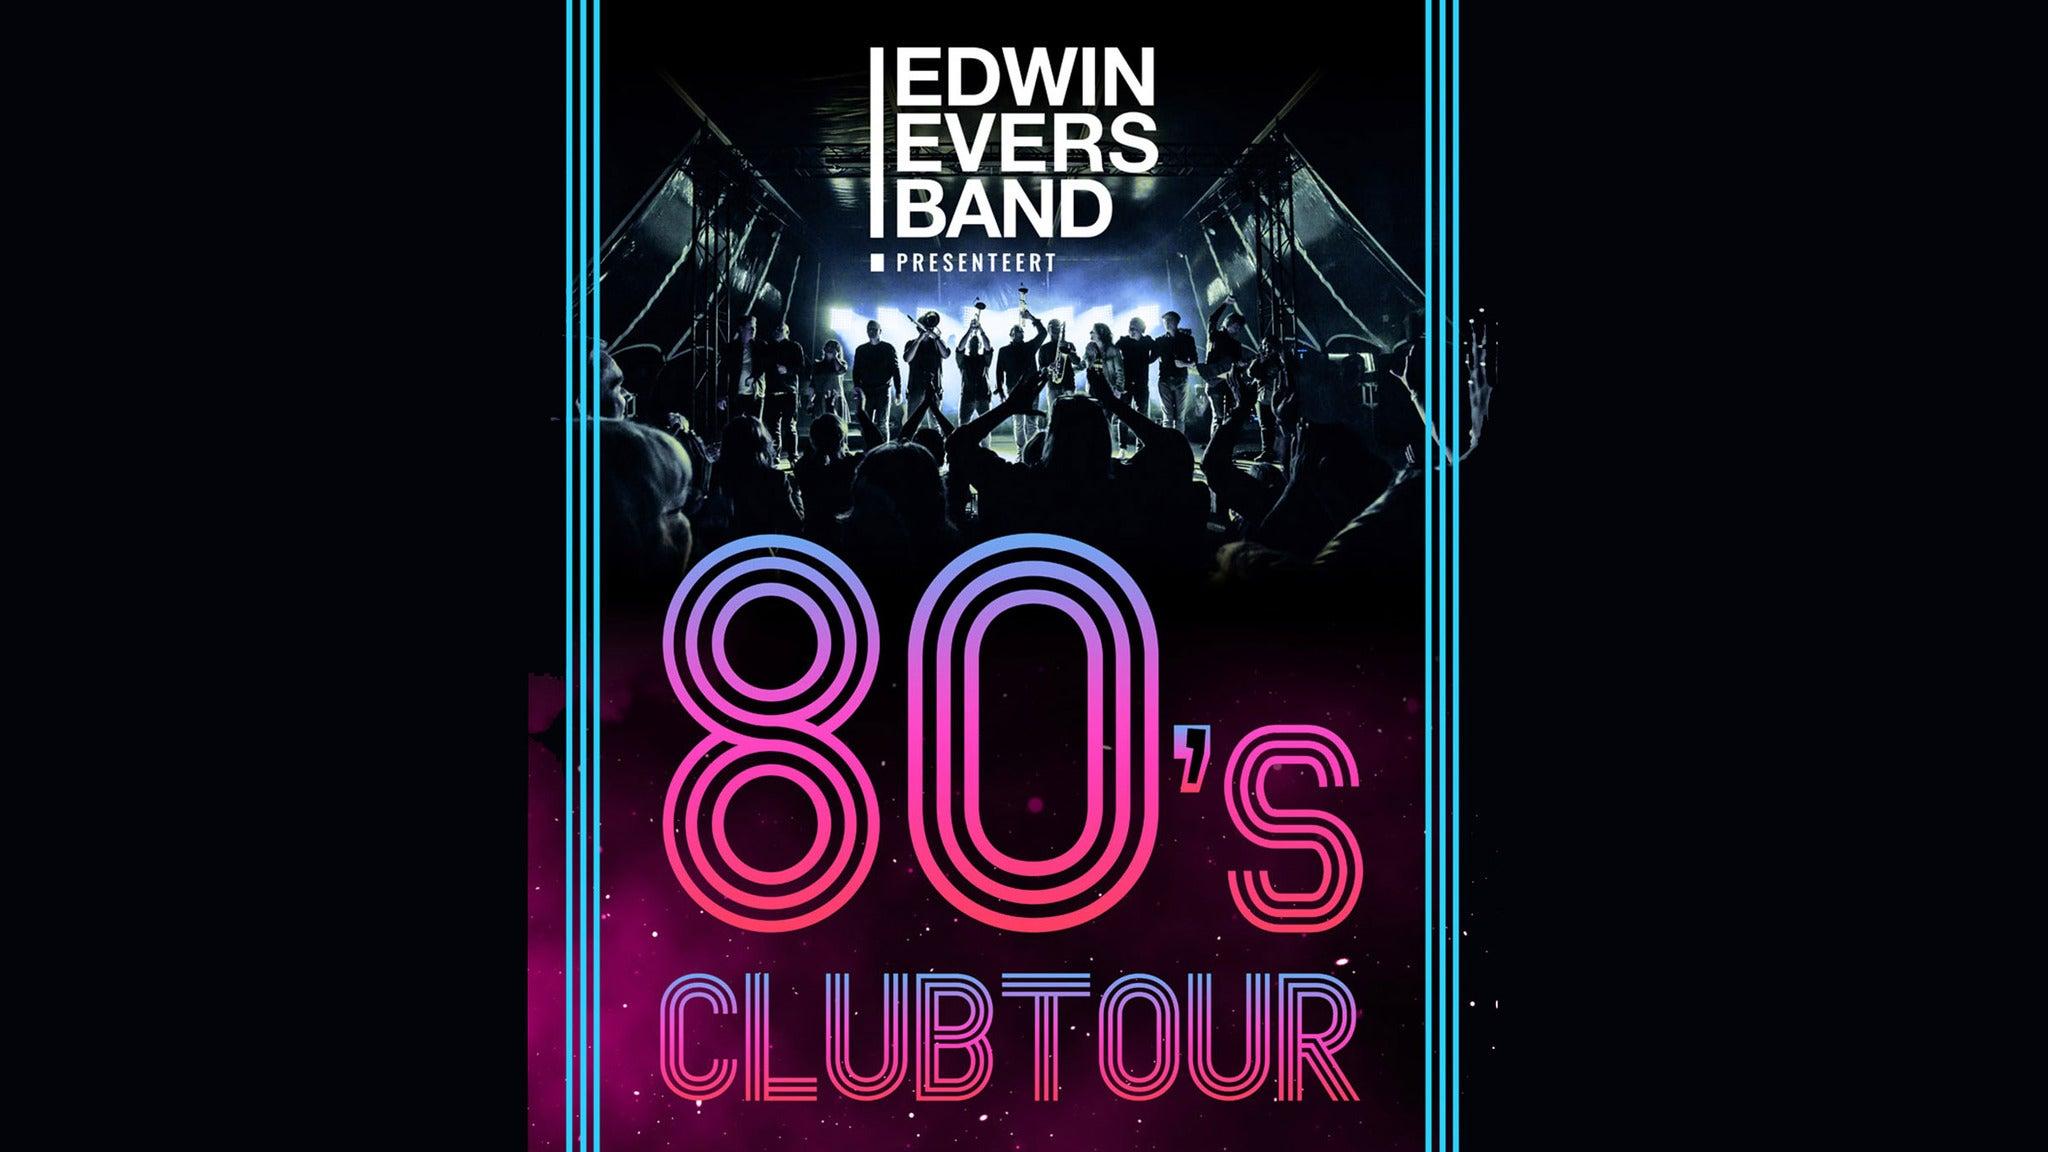 Edwin Evers Band